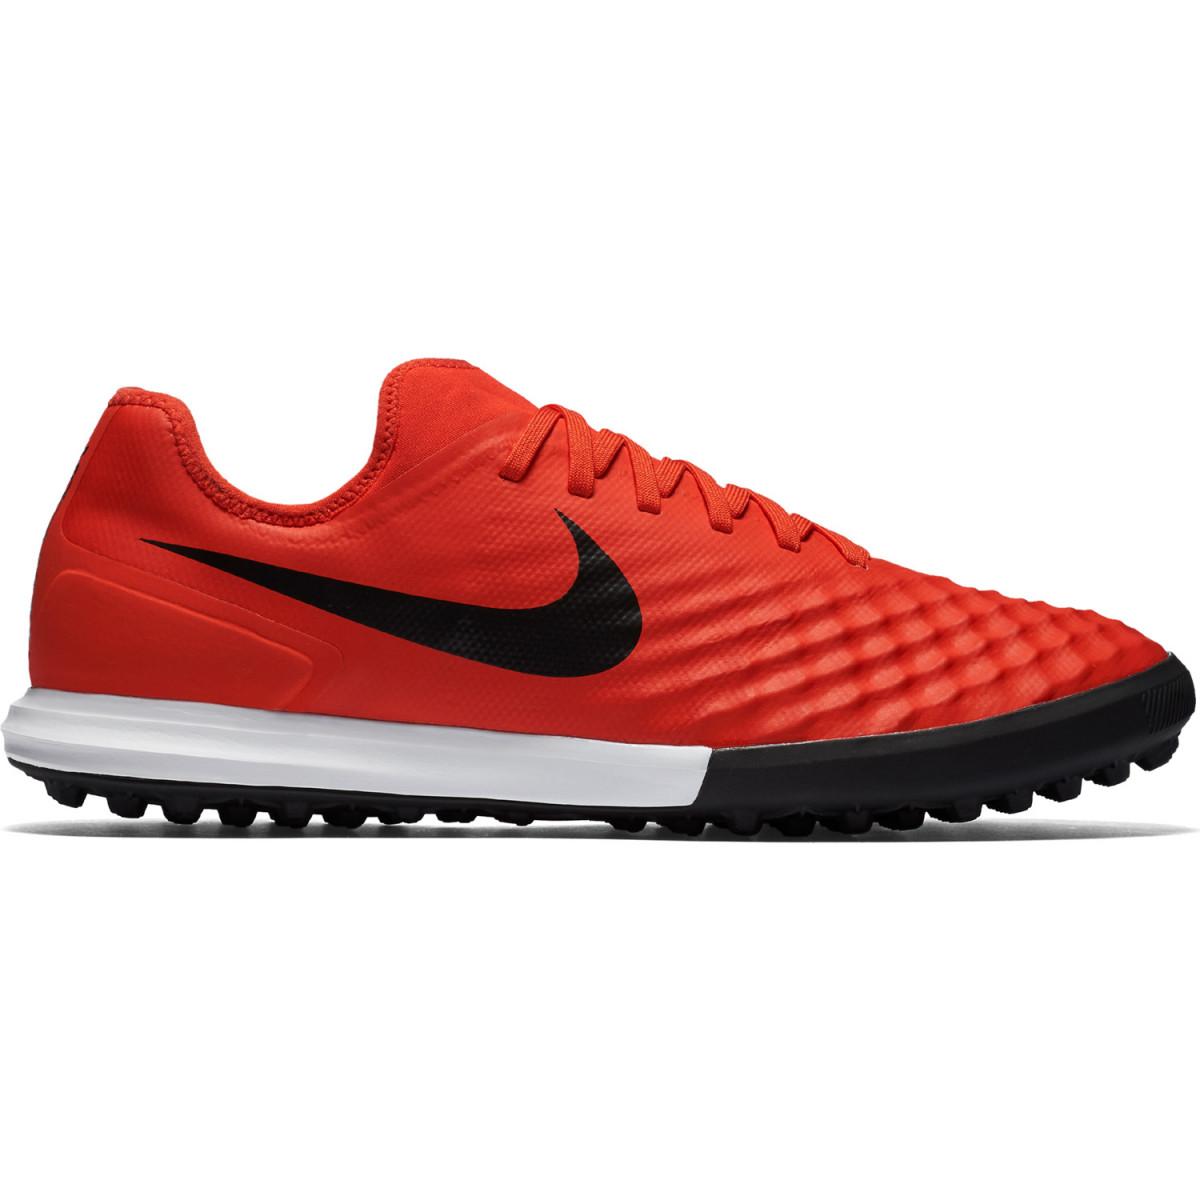 261d9c8e8154c Botines Nike Magista Finale II Tf